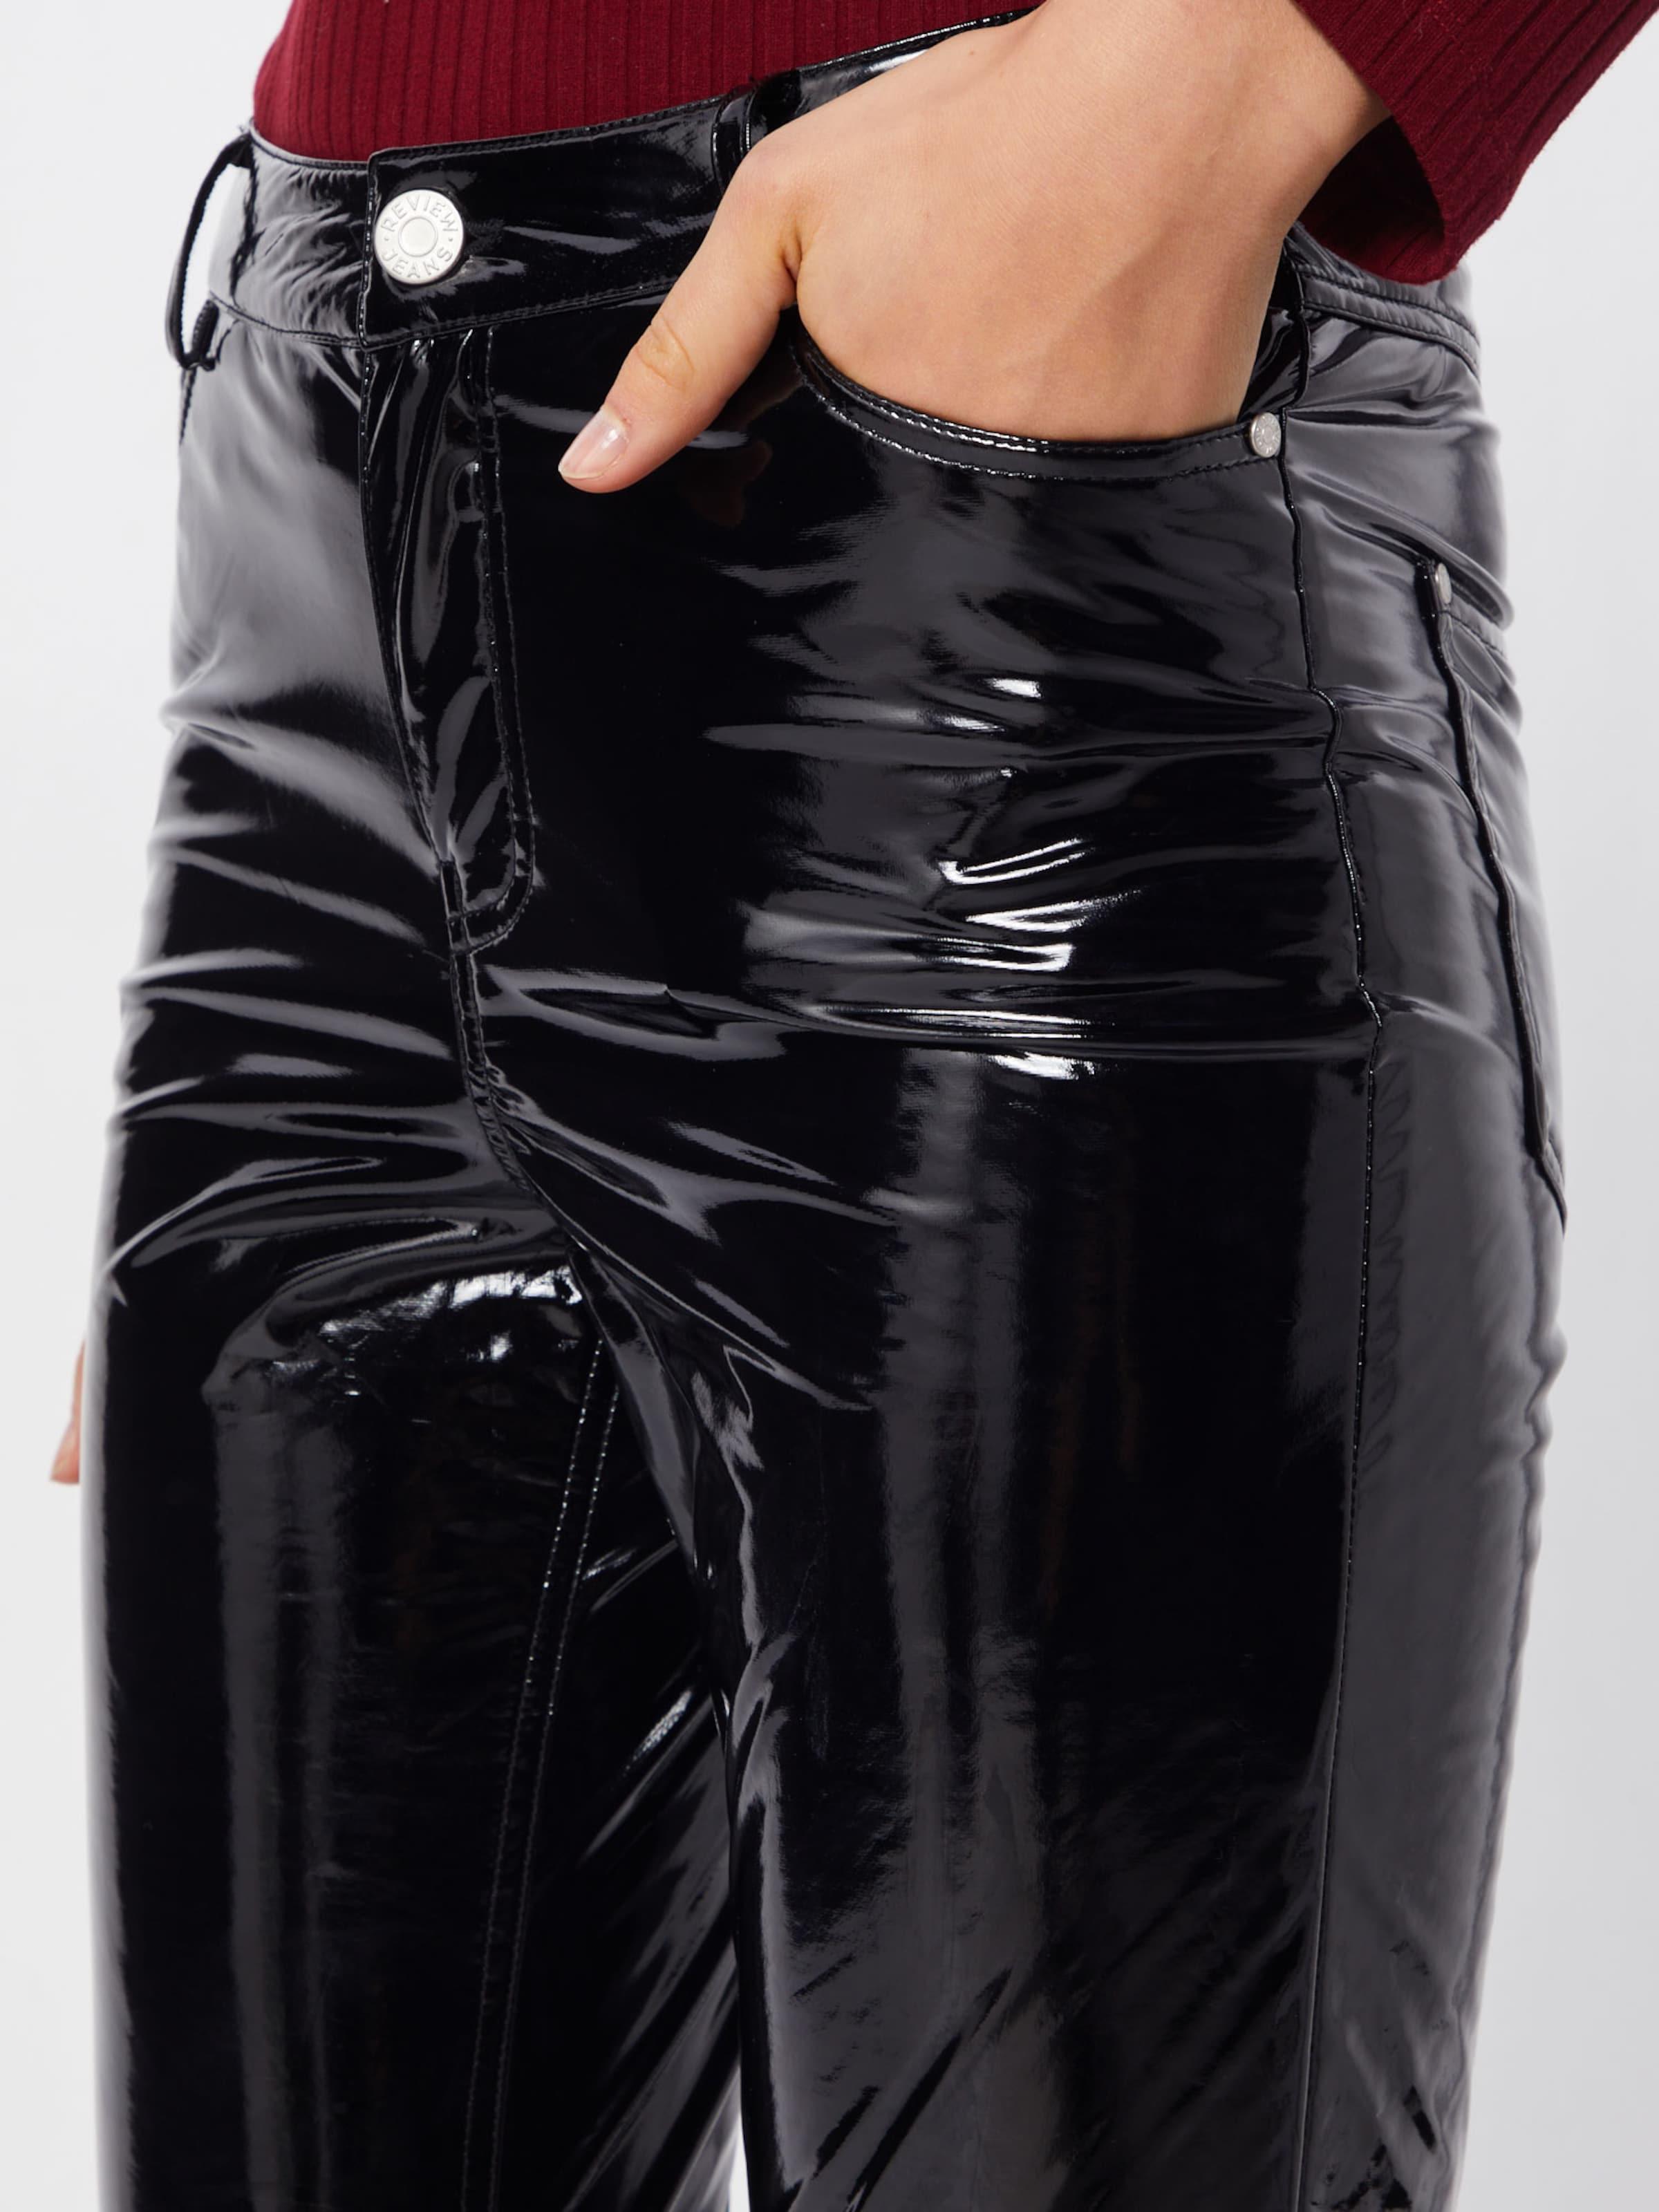 Pantalon En Review Ankle' 'lacquer Noir bgY76yf